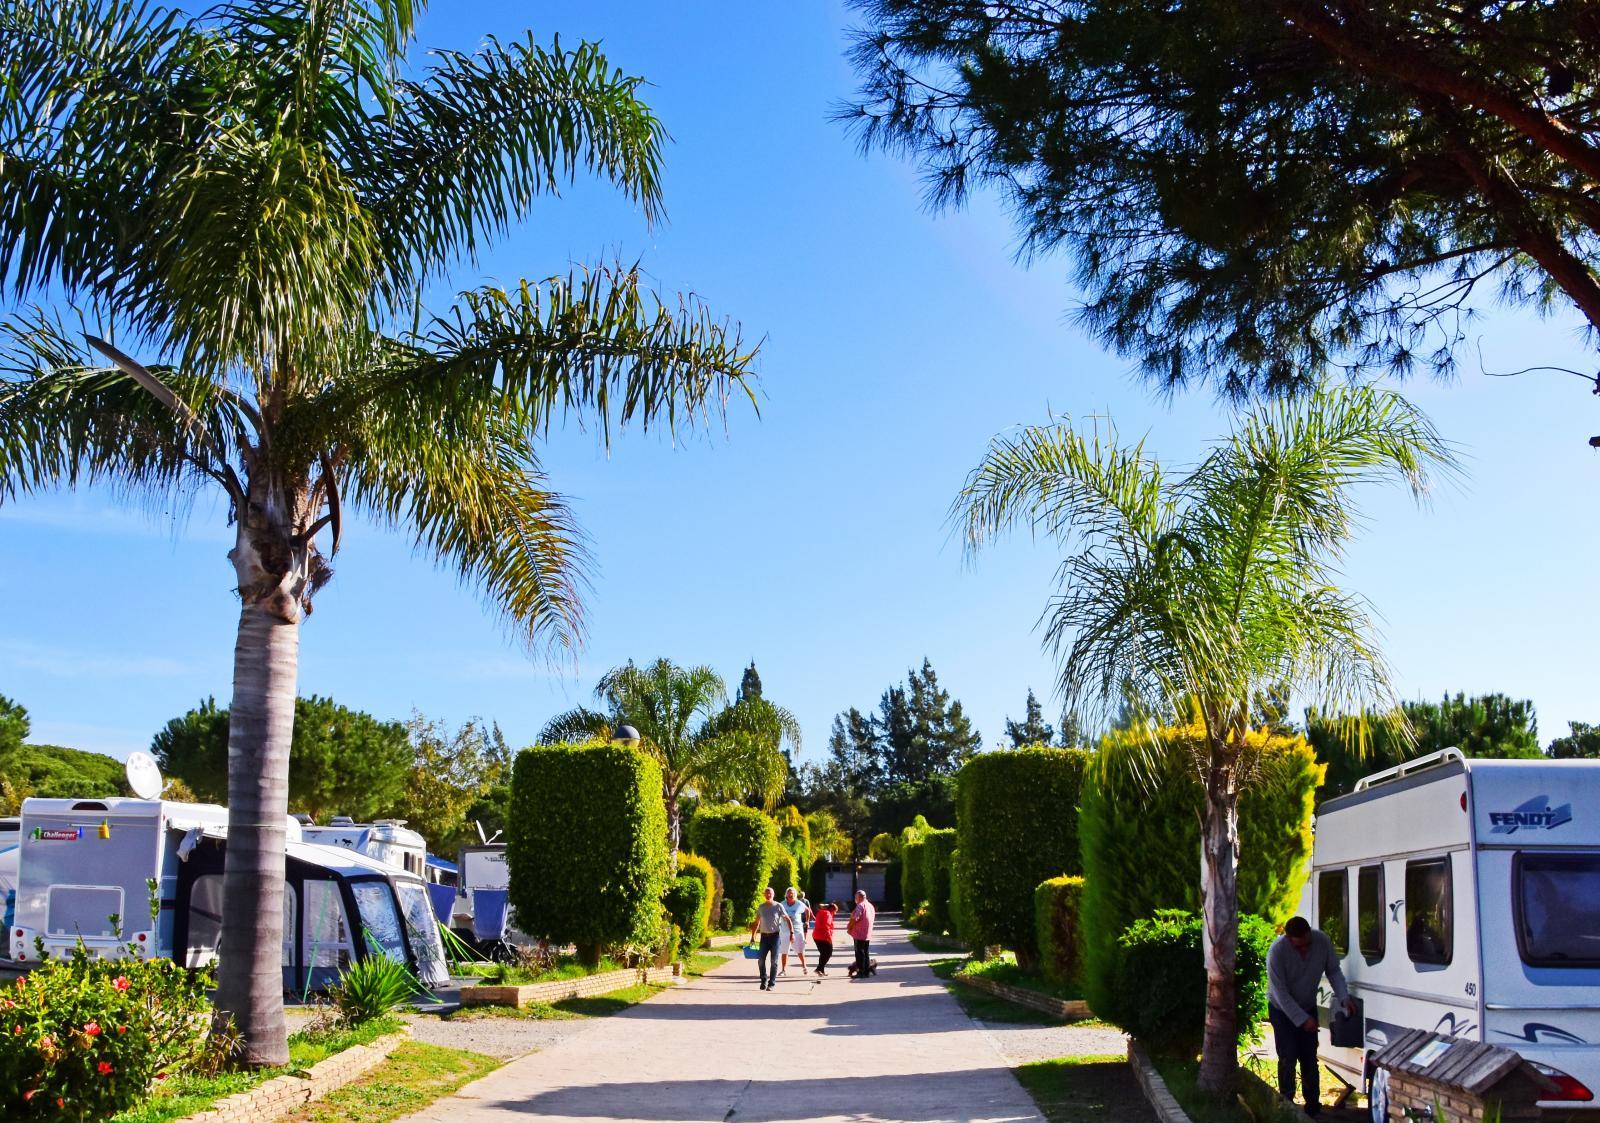 Campar gör man bäst i grannorten Puerto de SantaMaria.